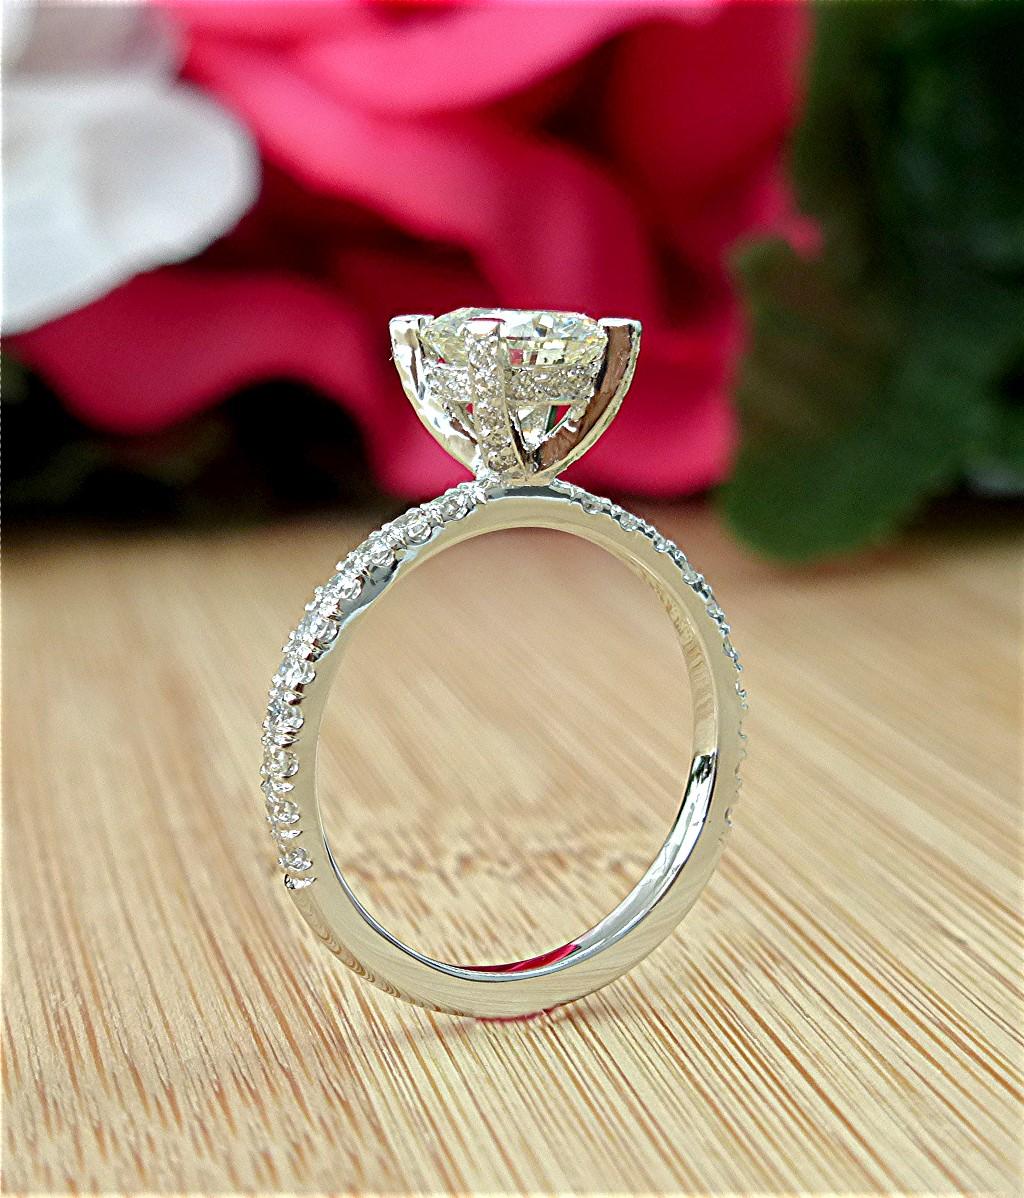 Diamond engagement ring with Diamond head basket